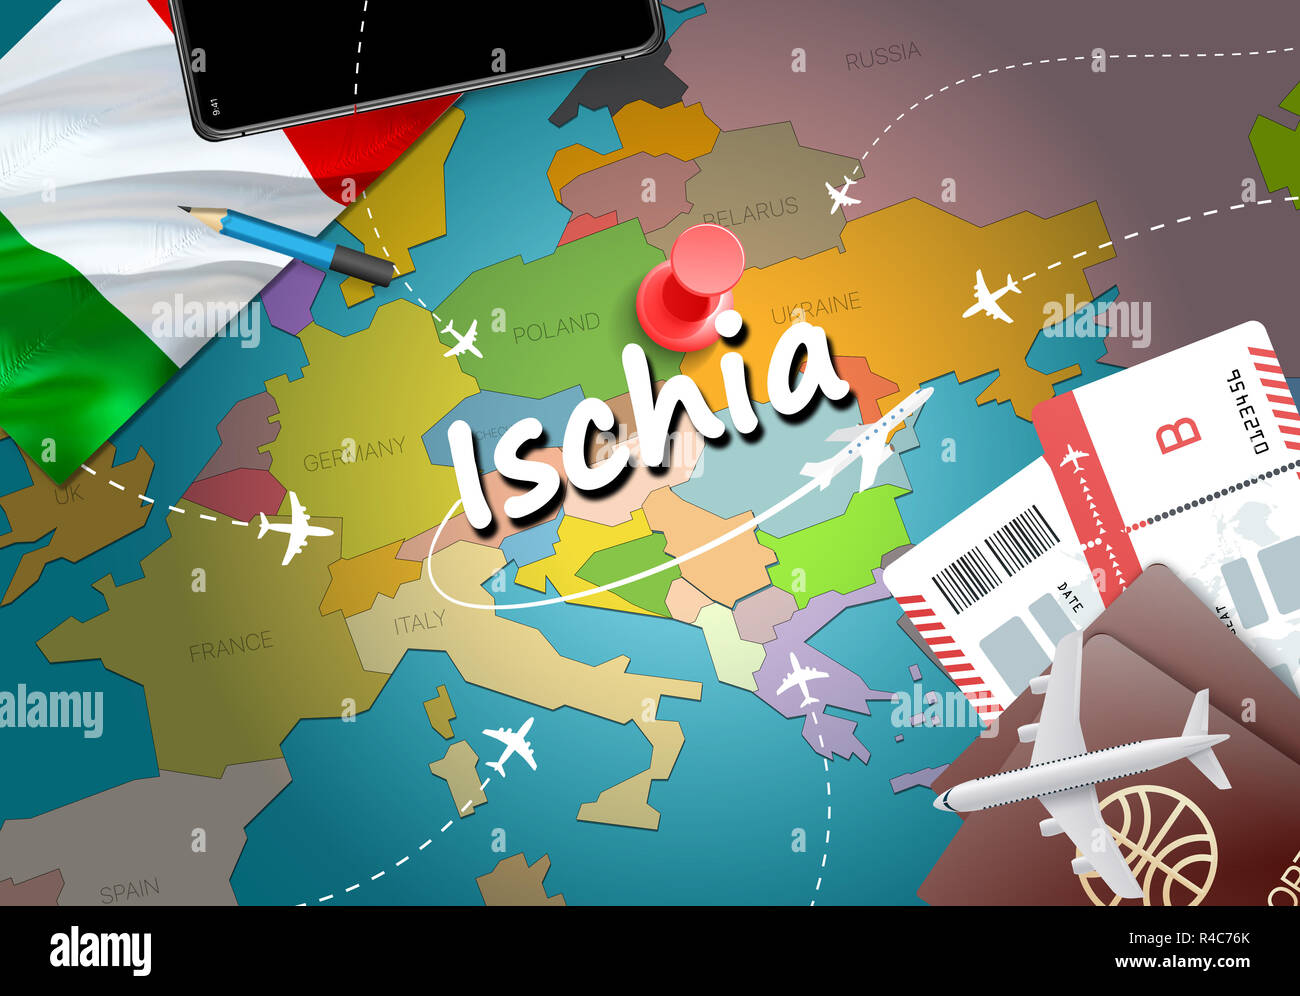 Ischia City Travel And Tourism Destination Concept Italy